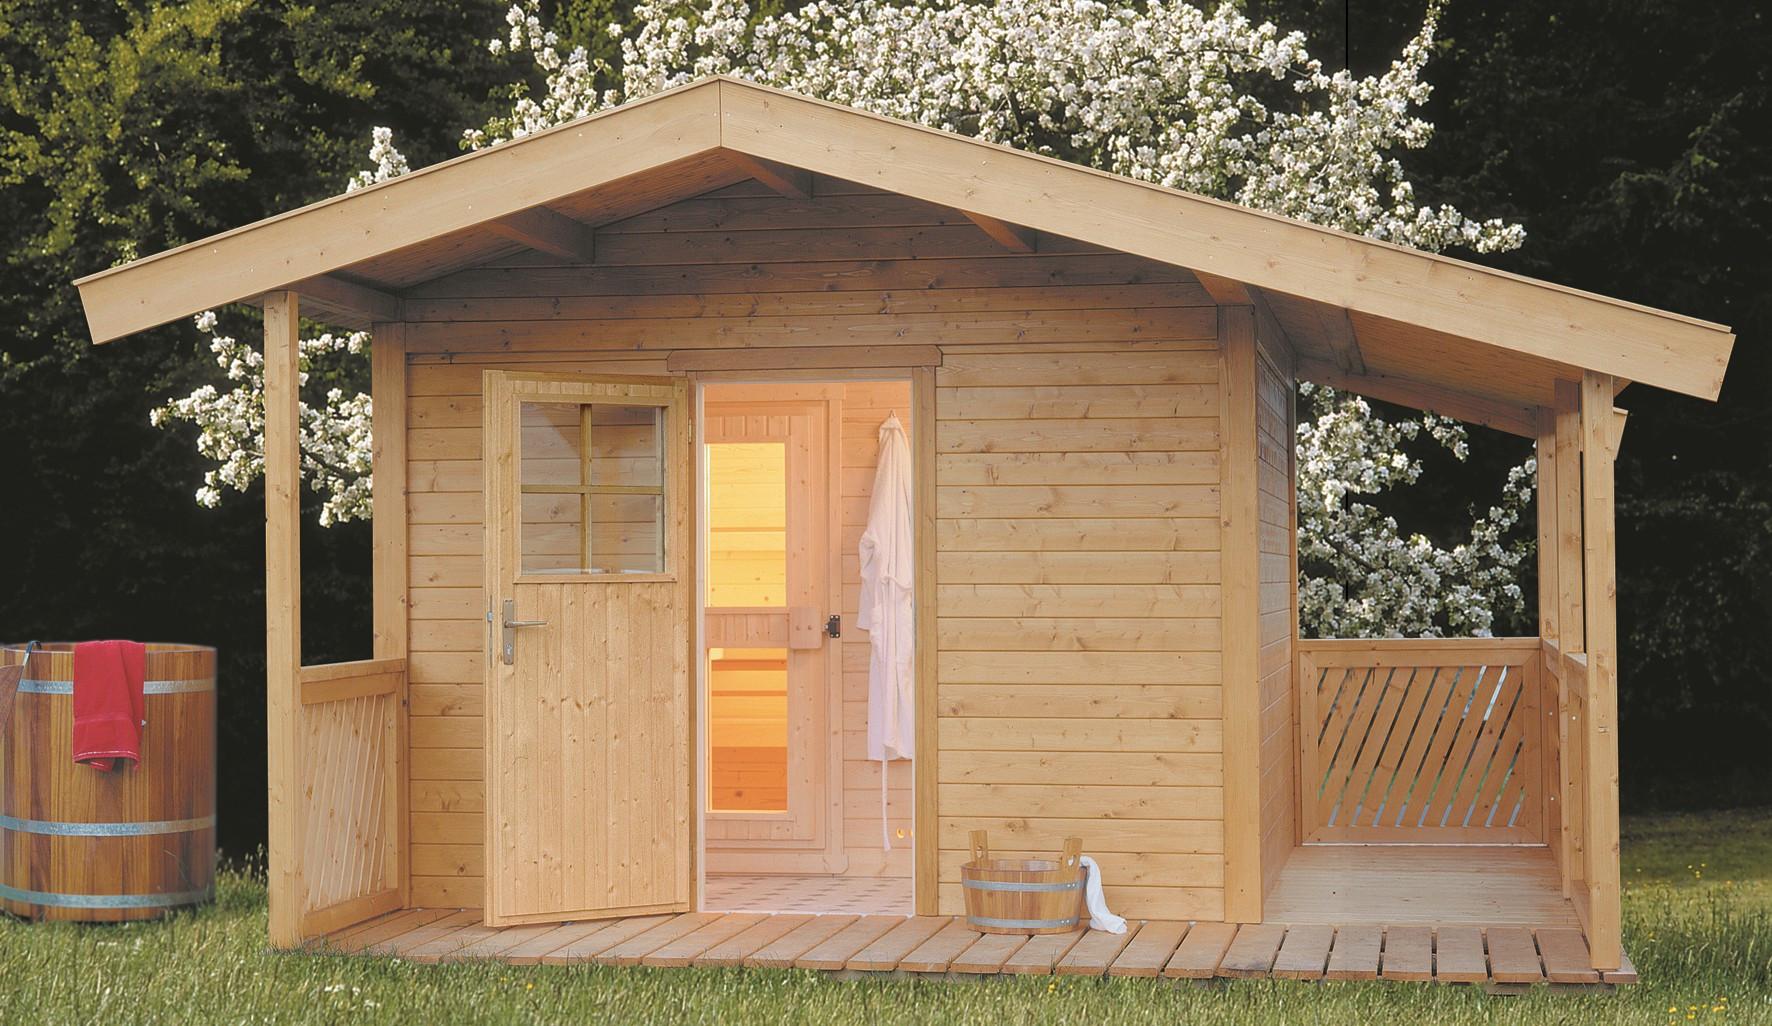 au ensauna gartensauna wille sauna. Black Bedroom Furniture Sets. Home Design Ideas